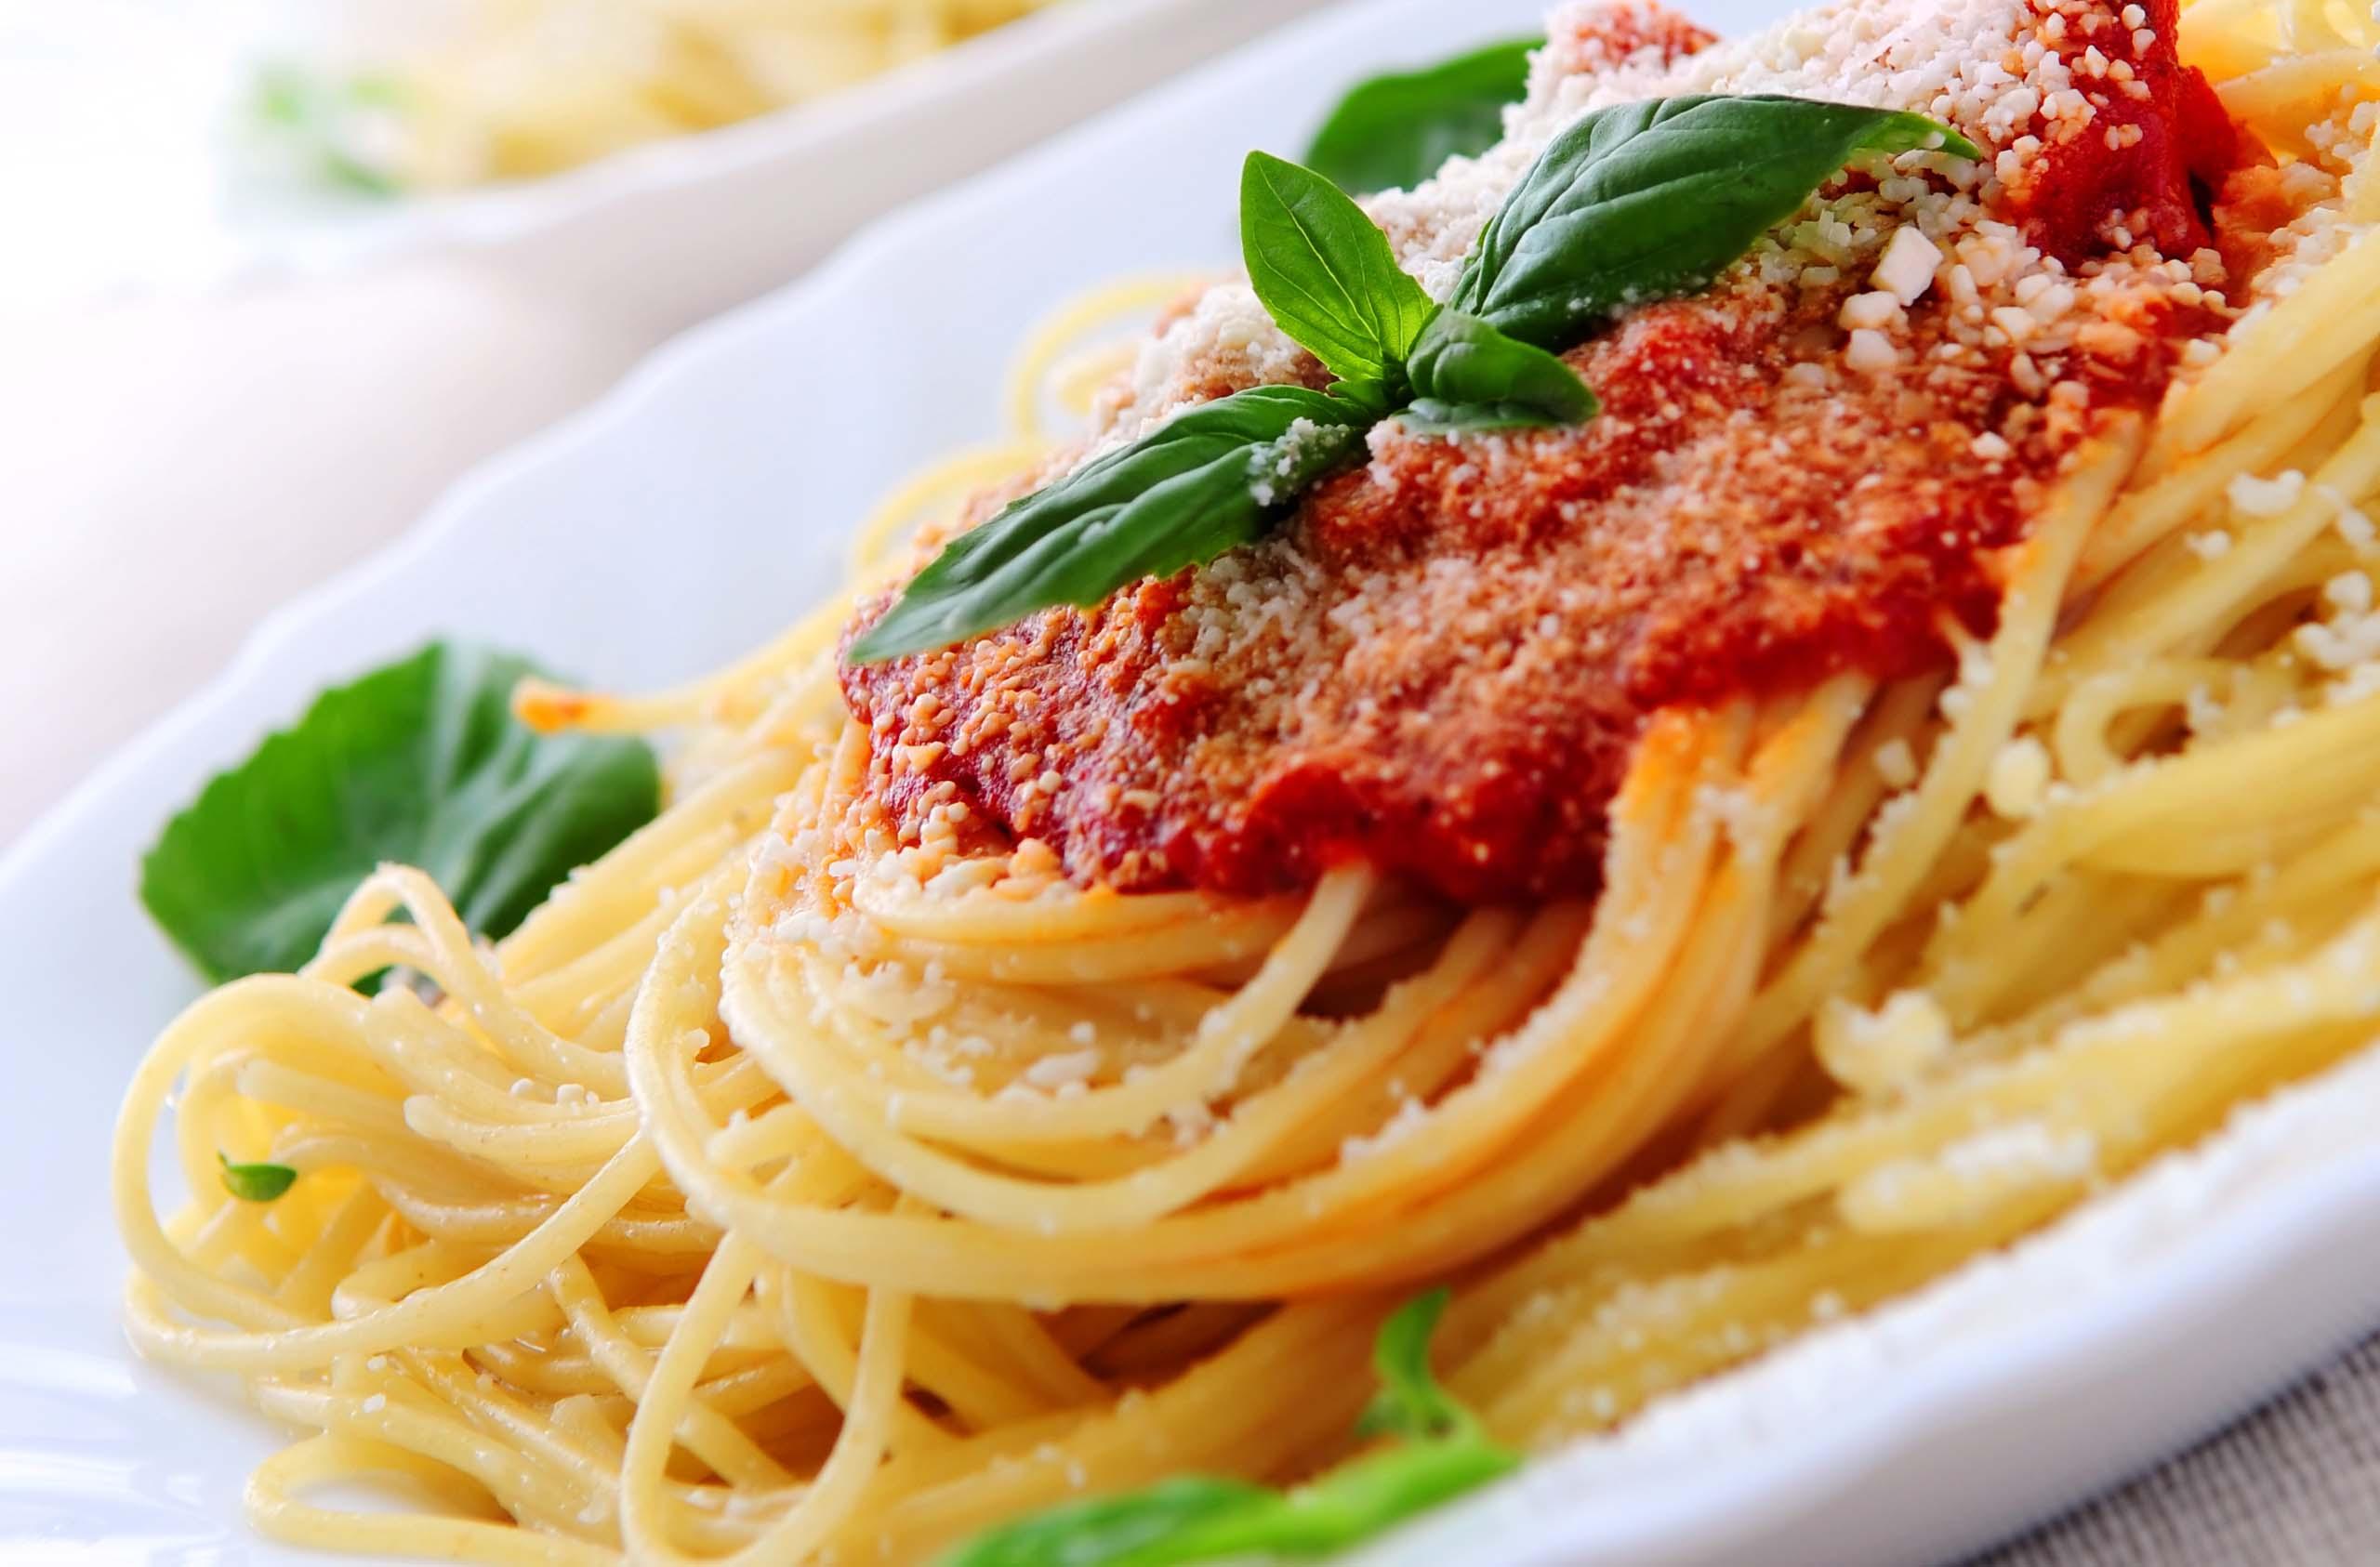 Pasta Marinara Fotolia_6221608_Subscription_Monthly_XL1